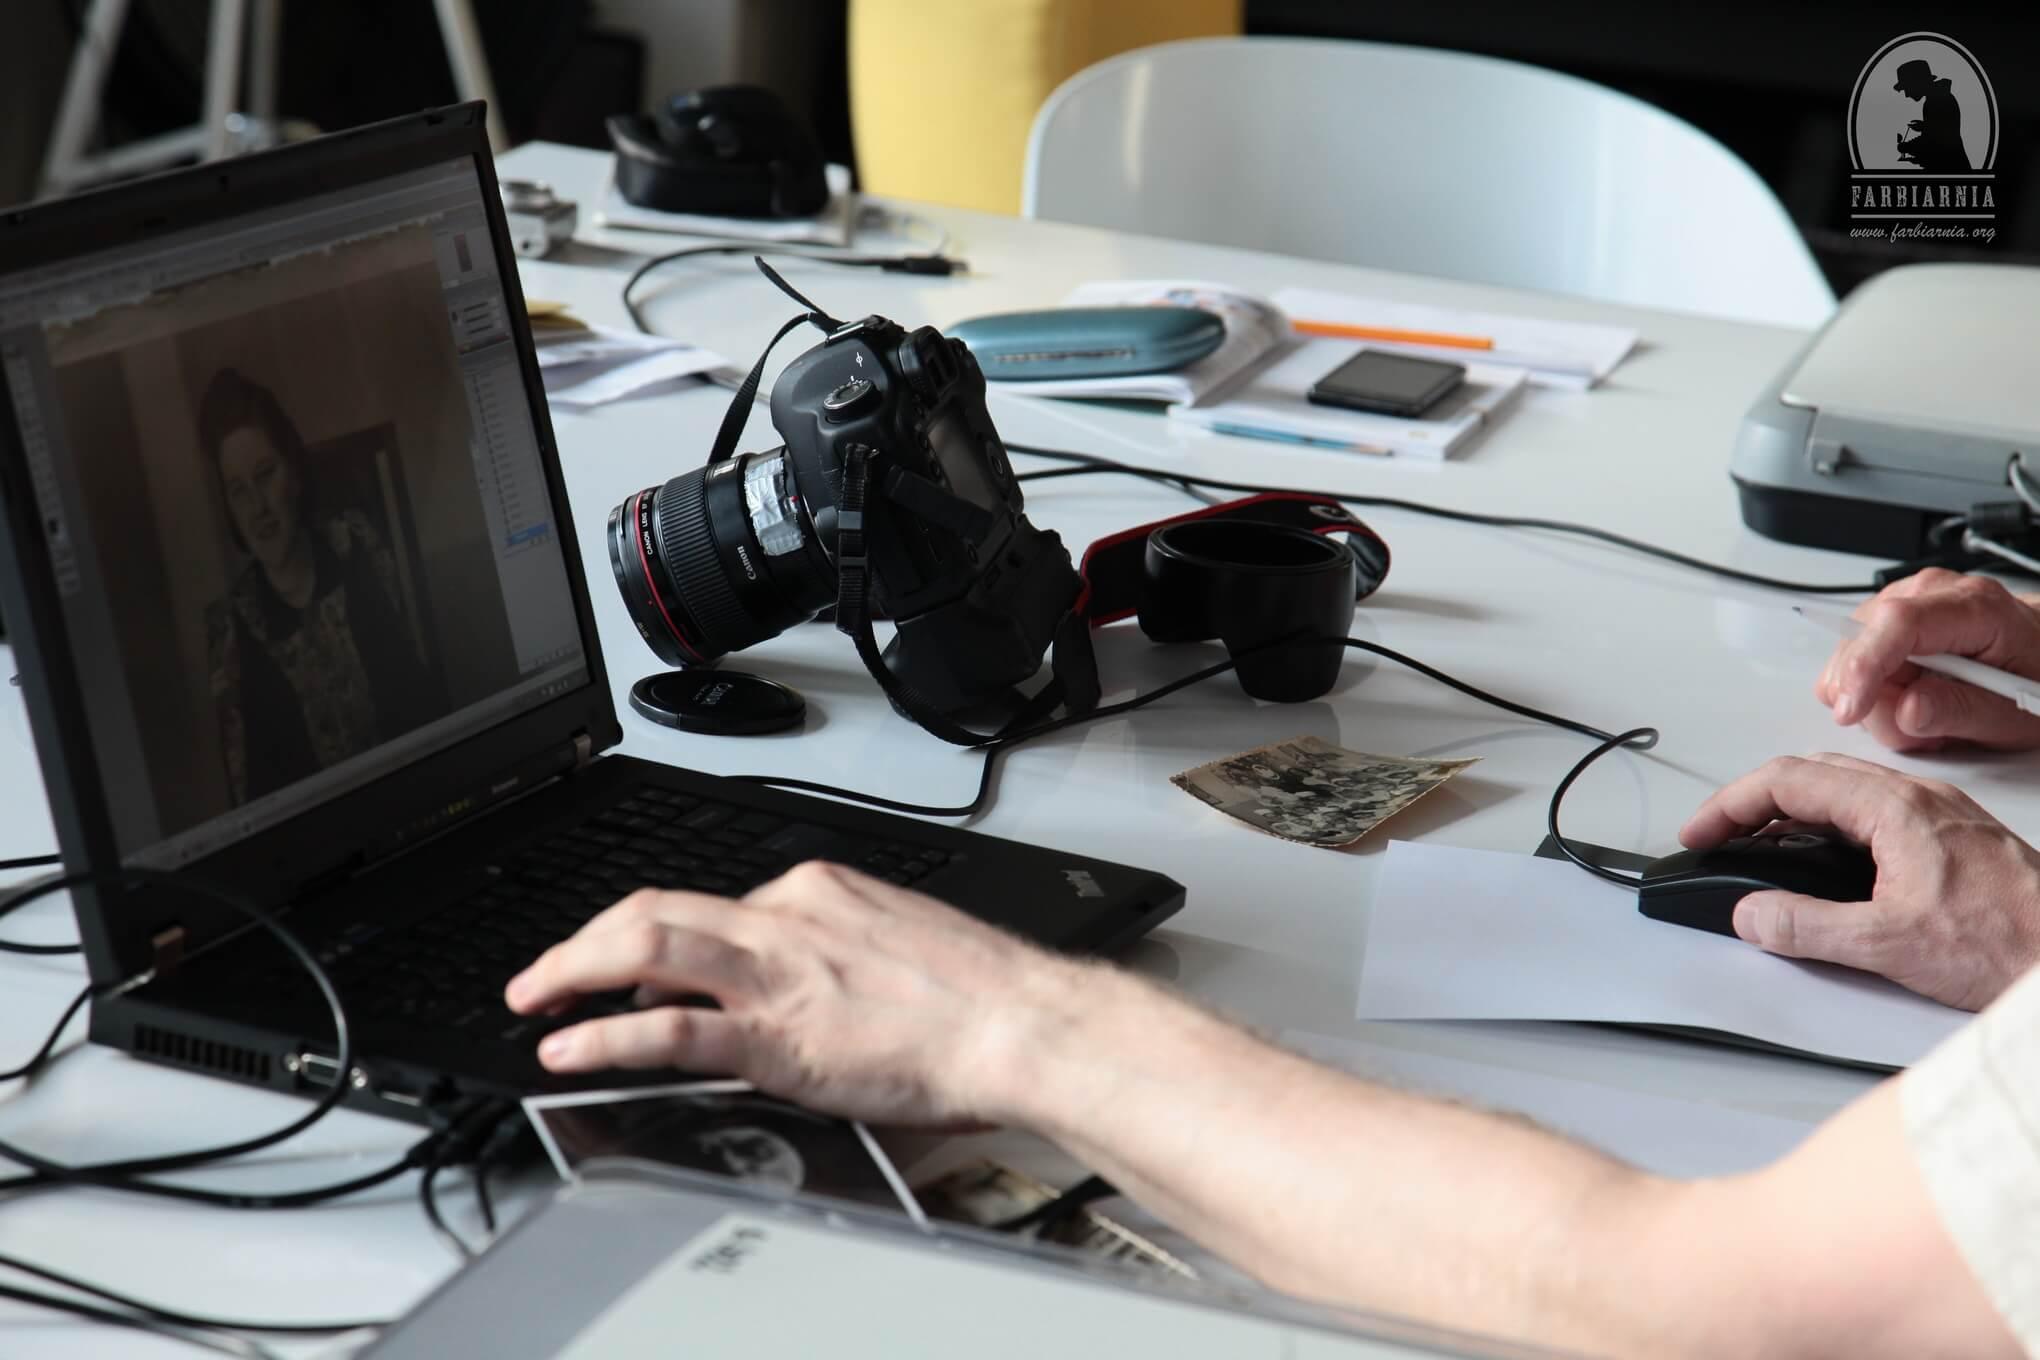 Fotografowie 60+w cyberprzestrzeni